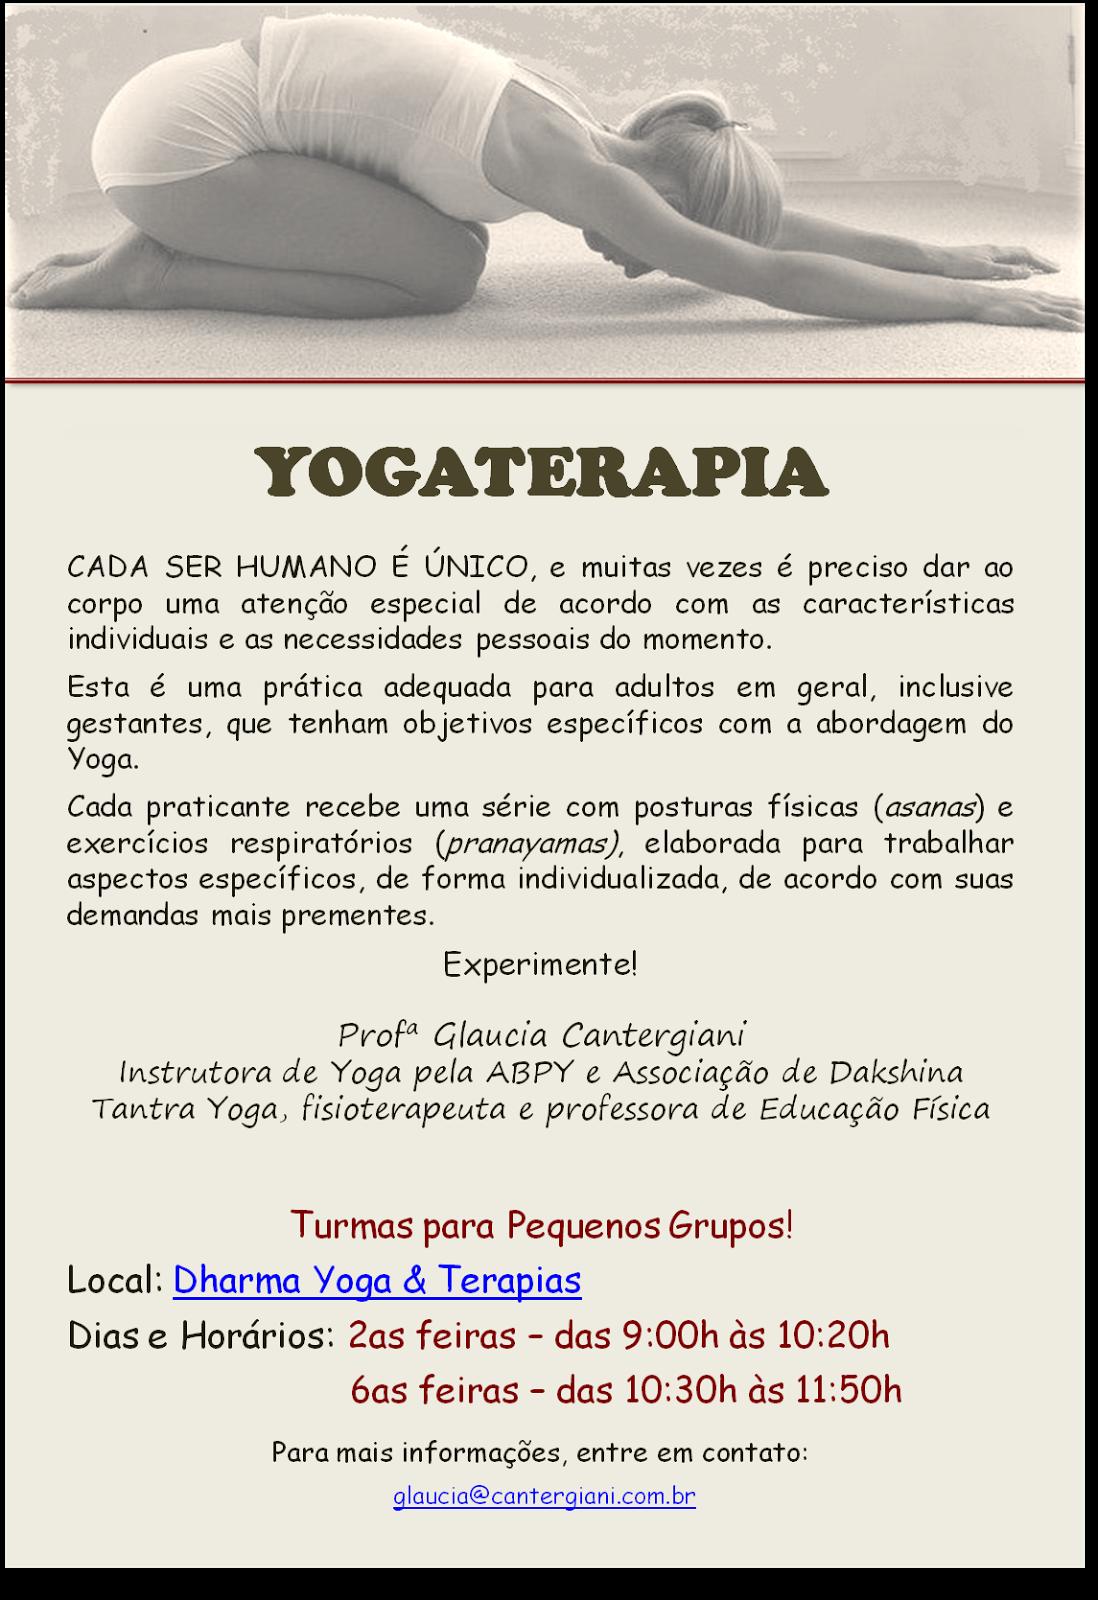 YOGATERAPIA - Yoga para tratar!